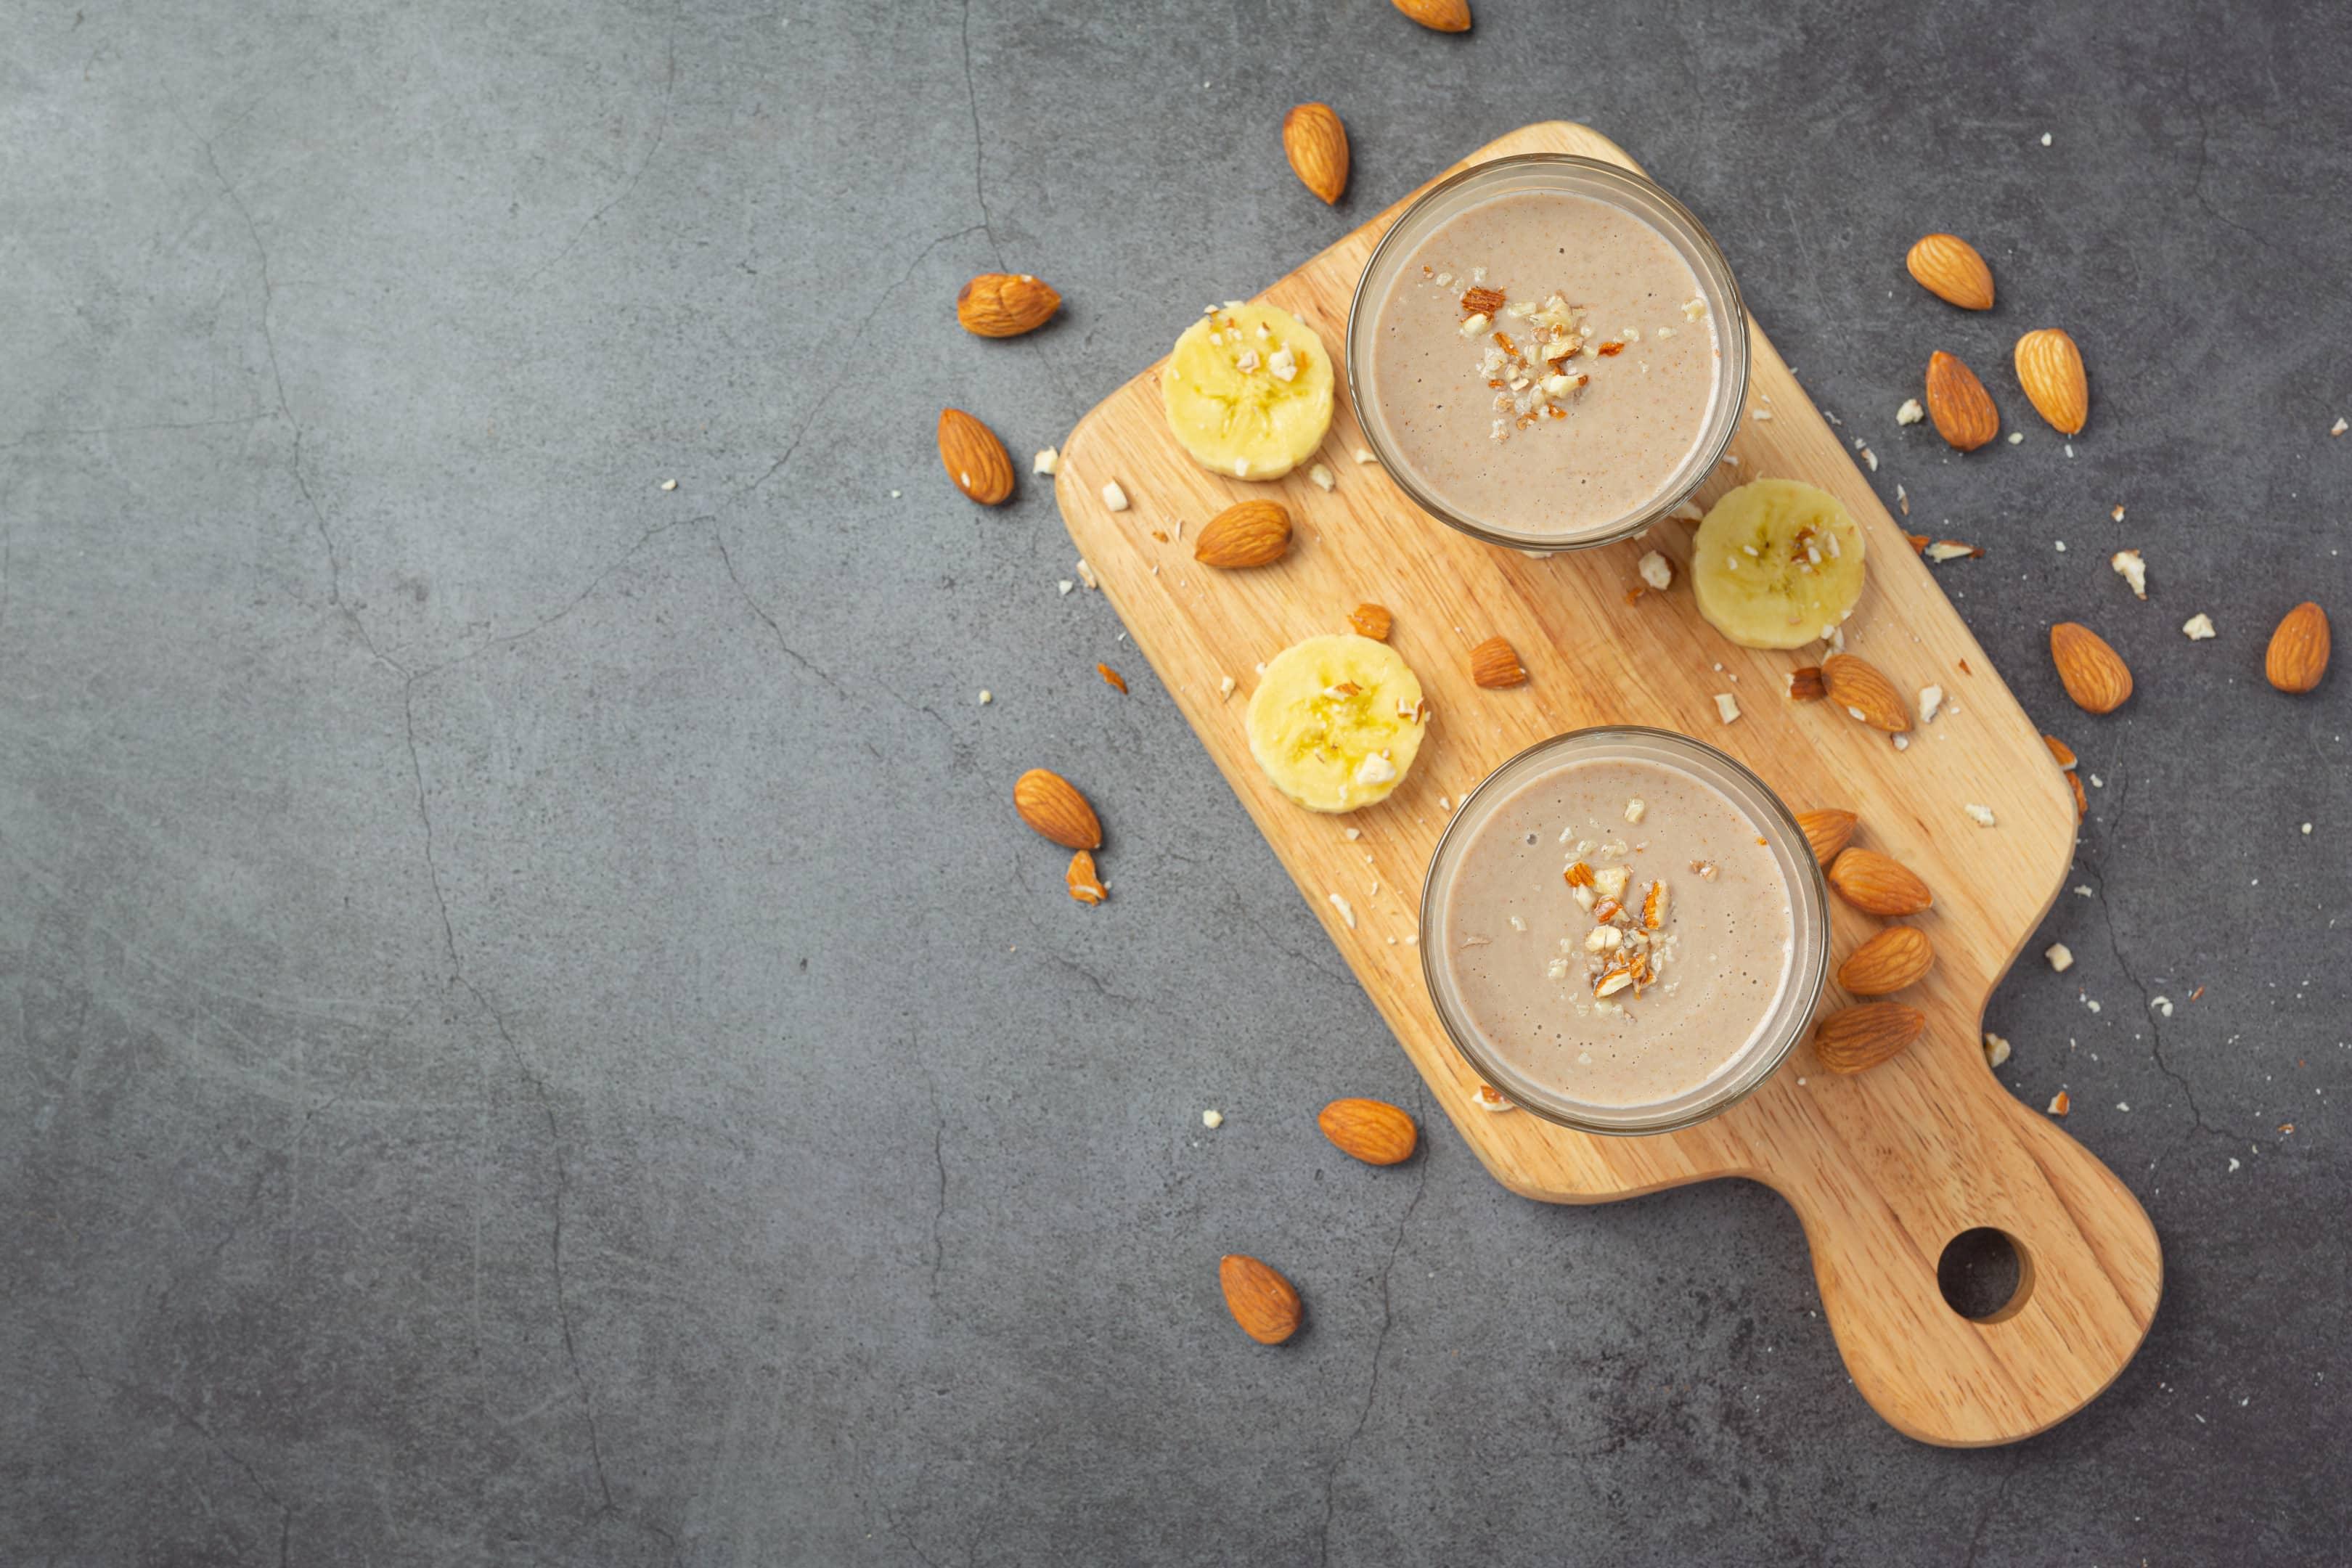 Banana & almond smoothie on dark background